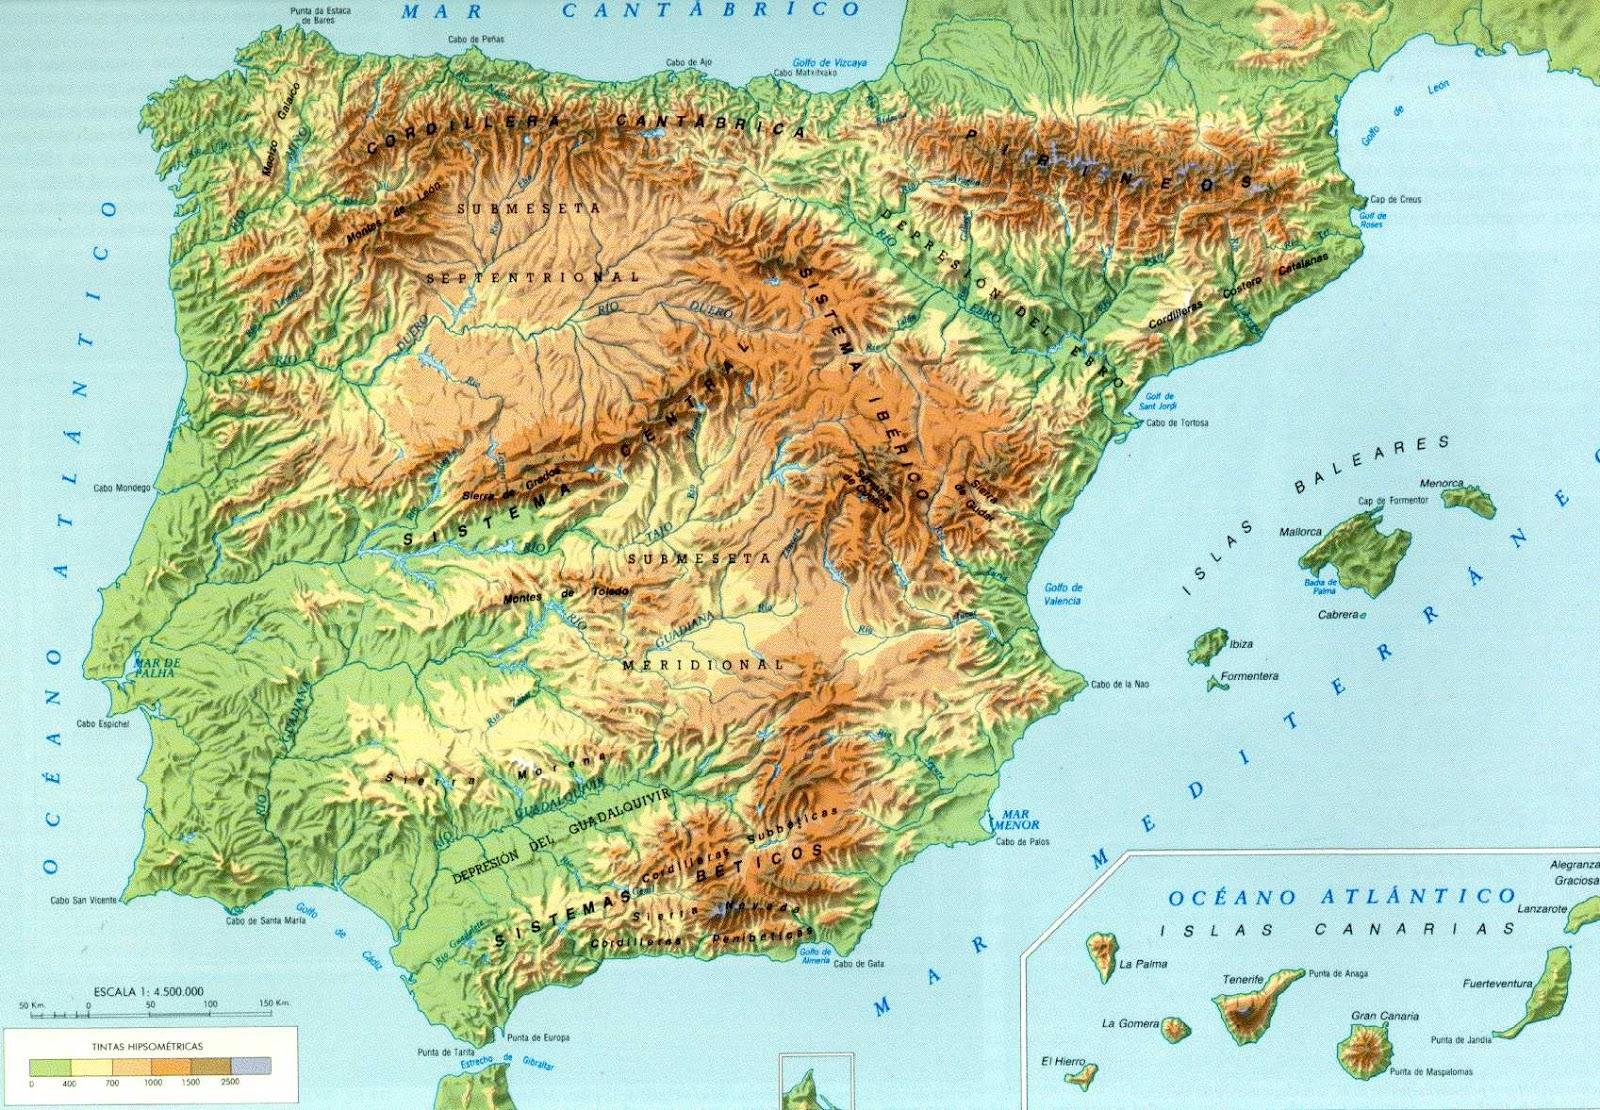 mapa fisico da peninsula iberica Biblioteca de Alejandría 3.0: Mapa físico de la península Ibérica mapa fisico da peninsula iberica